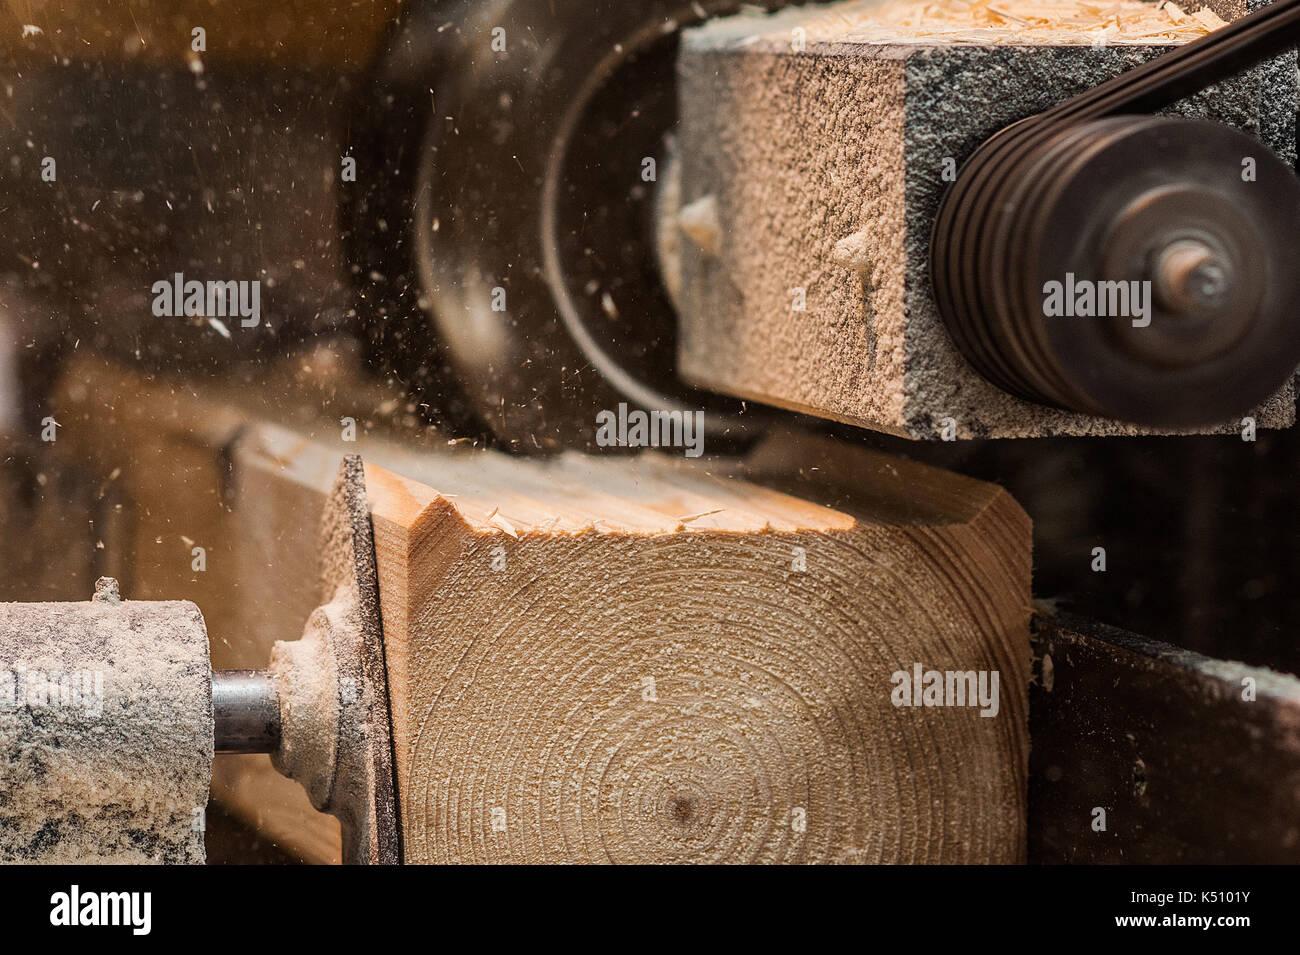 Close Up Di Una Retta Router Bit Il Taglio Di Una Scanalatura O